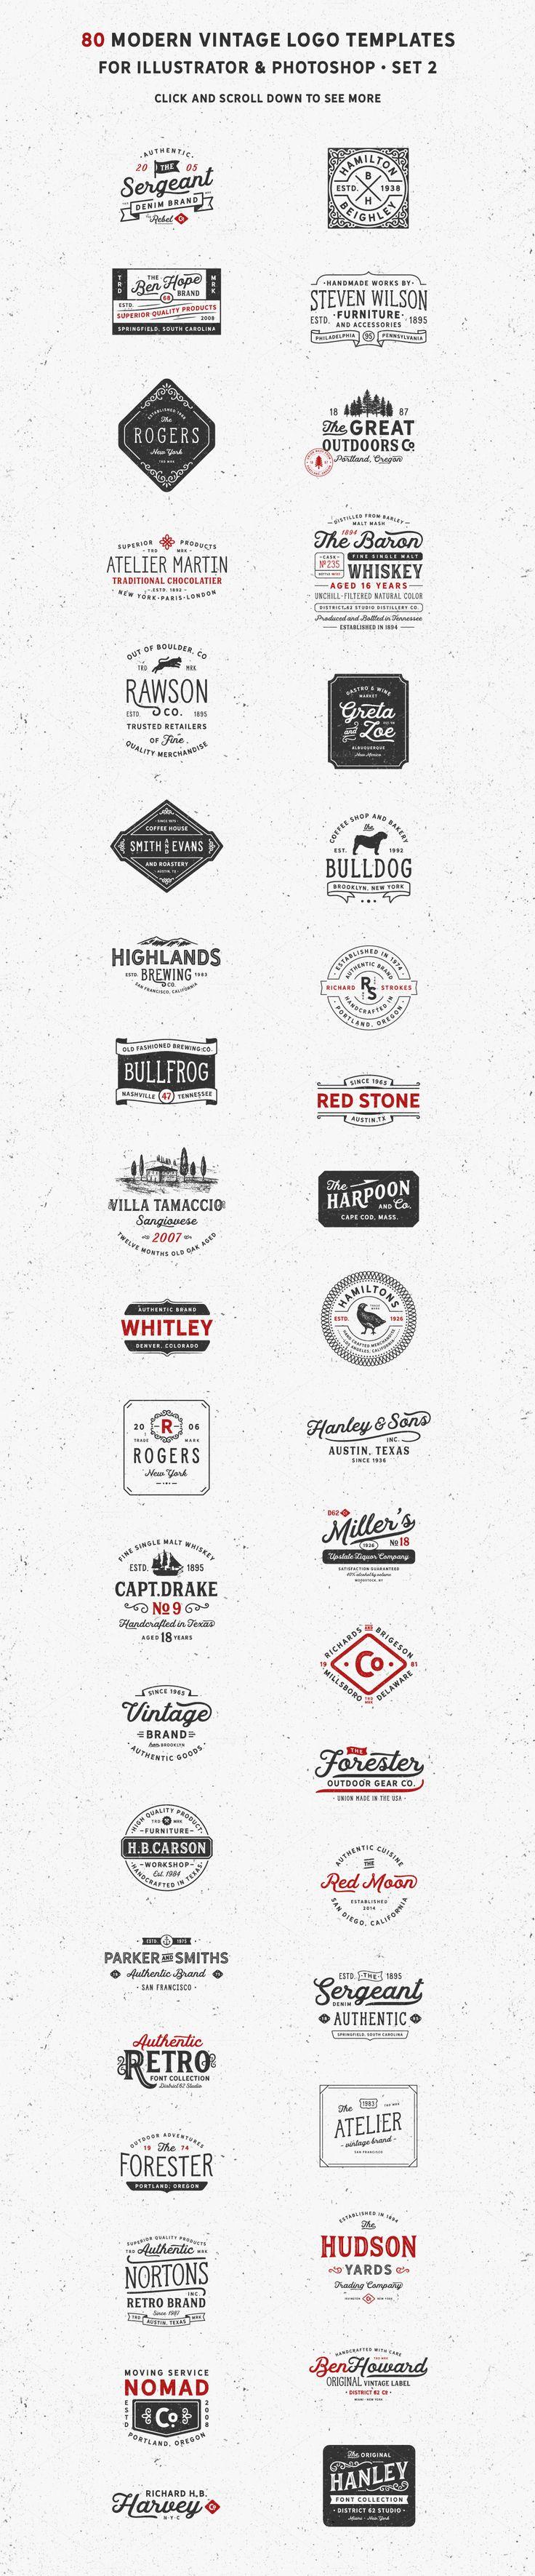 214 best ✏ Logo Design images on Pinterest | Brand design ...